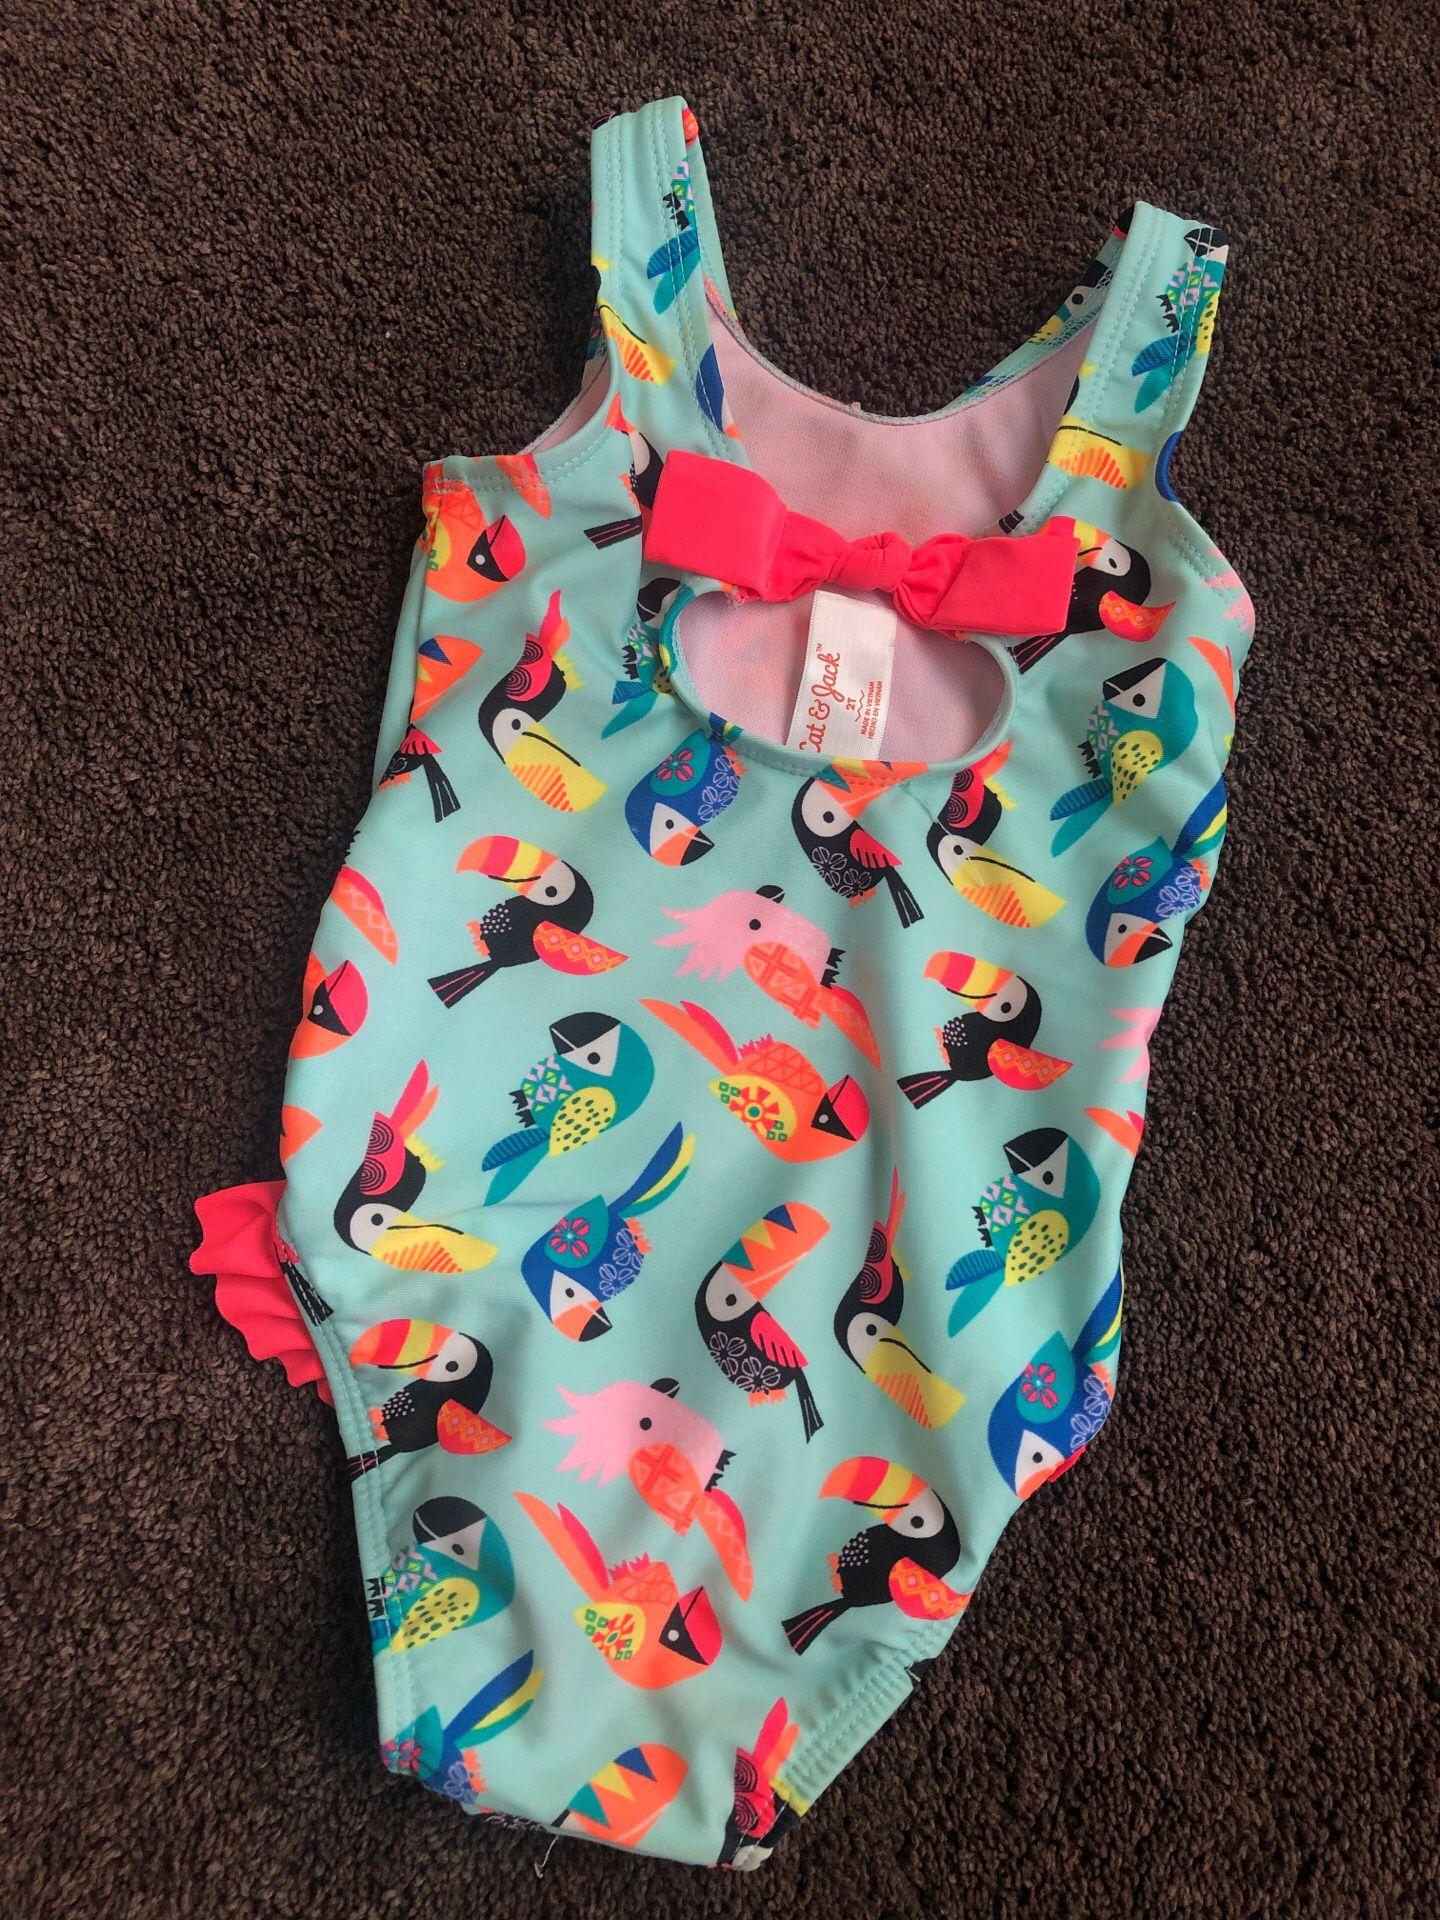 Toddler one piece bikini swimwear